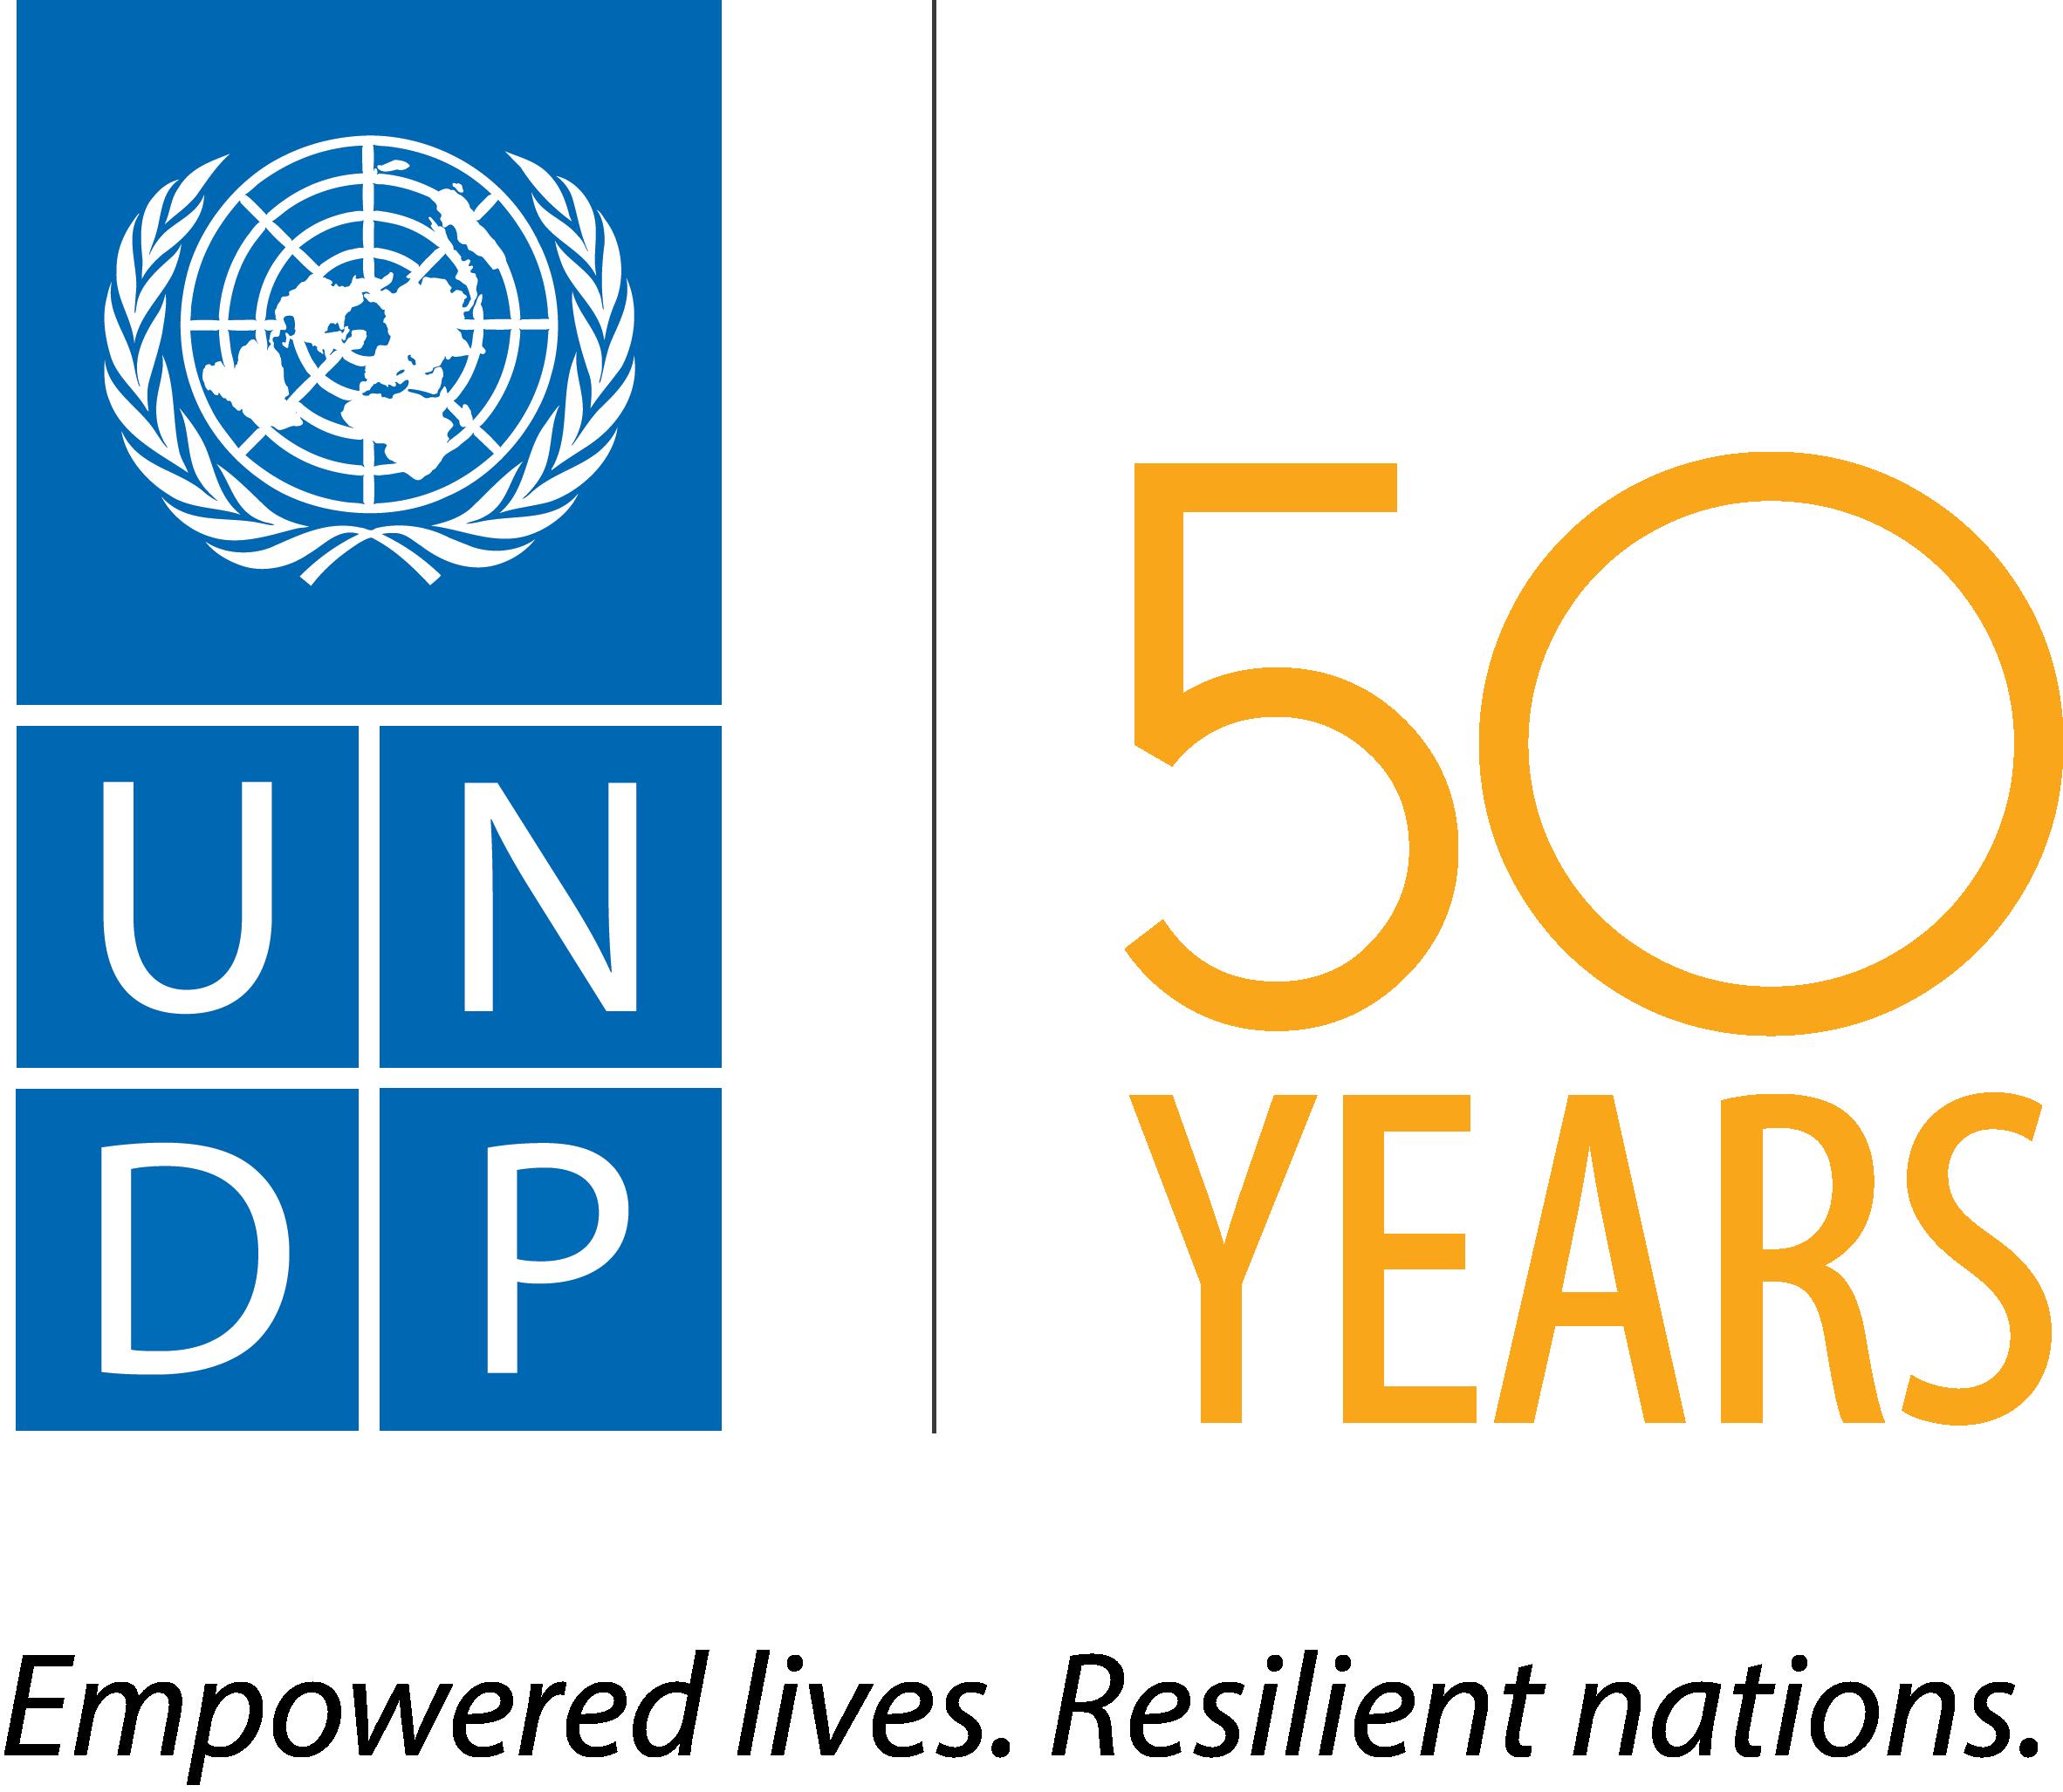 un_uzb_img_undp_logo